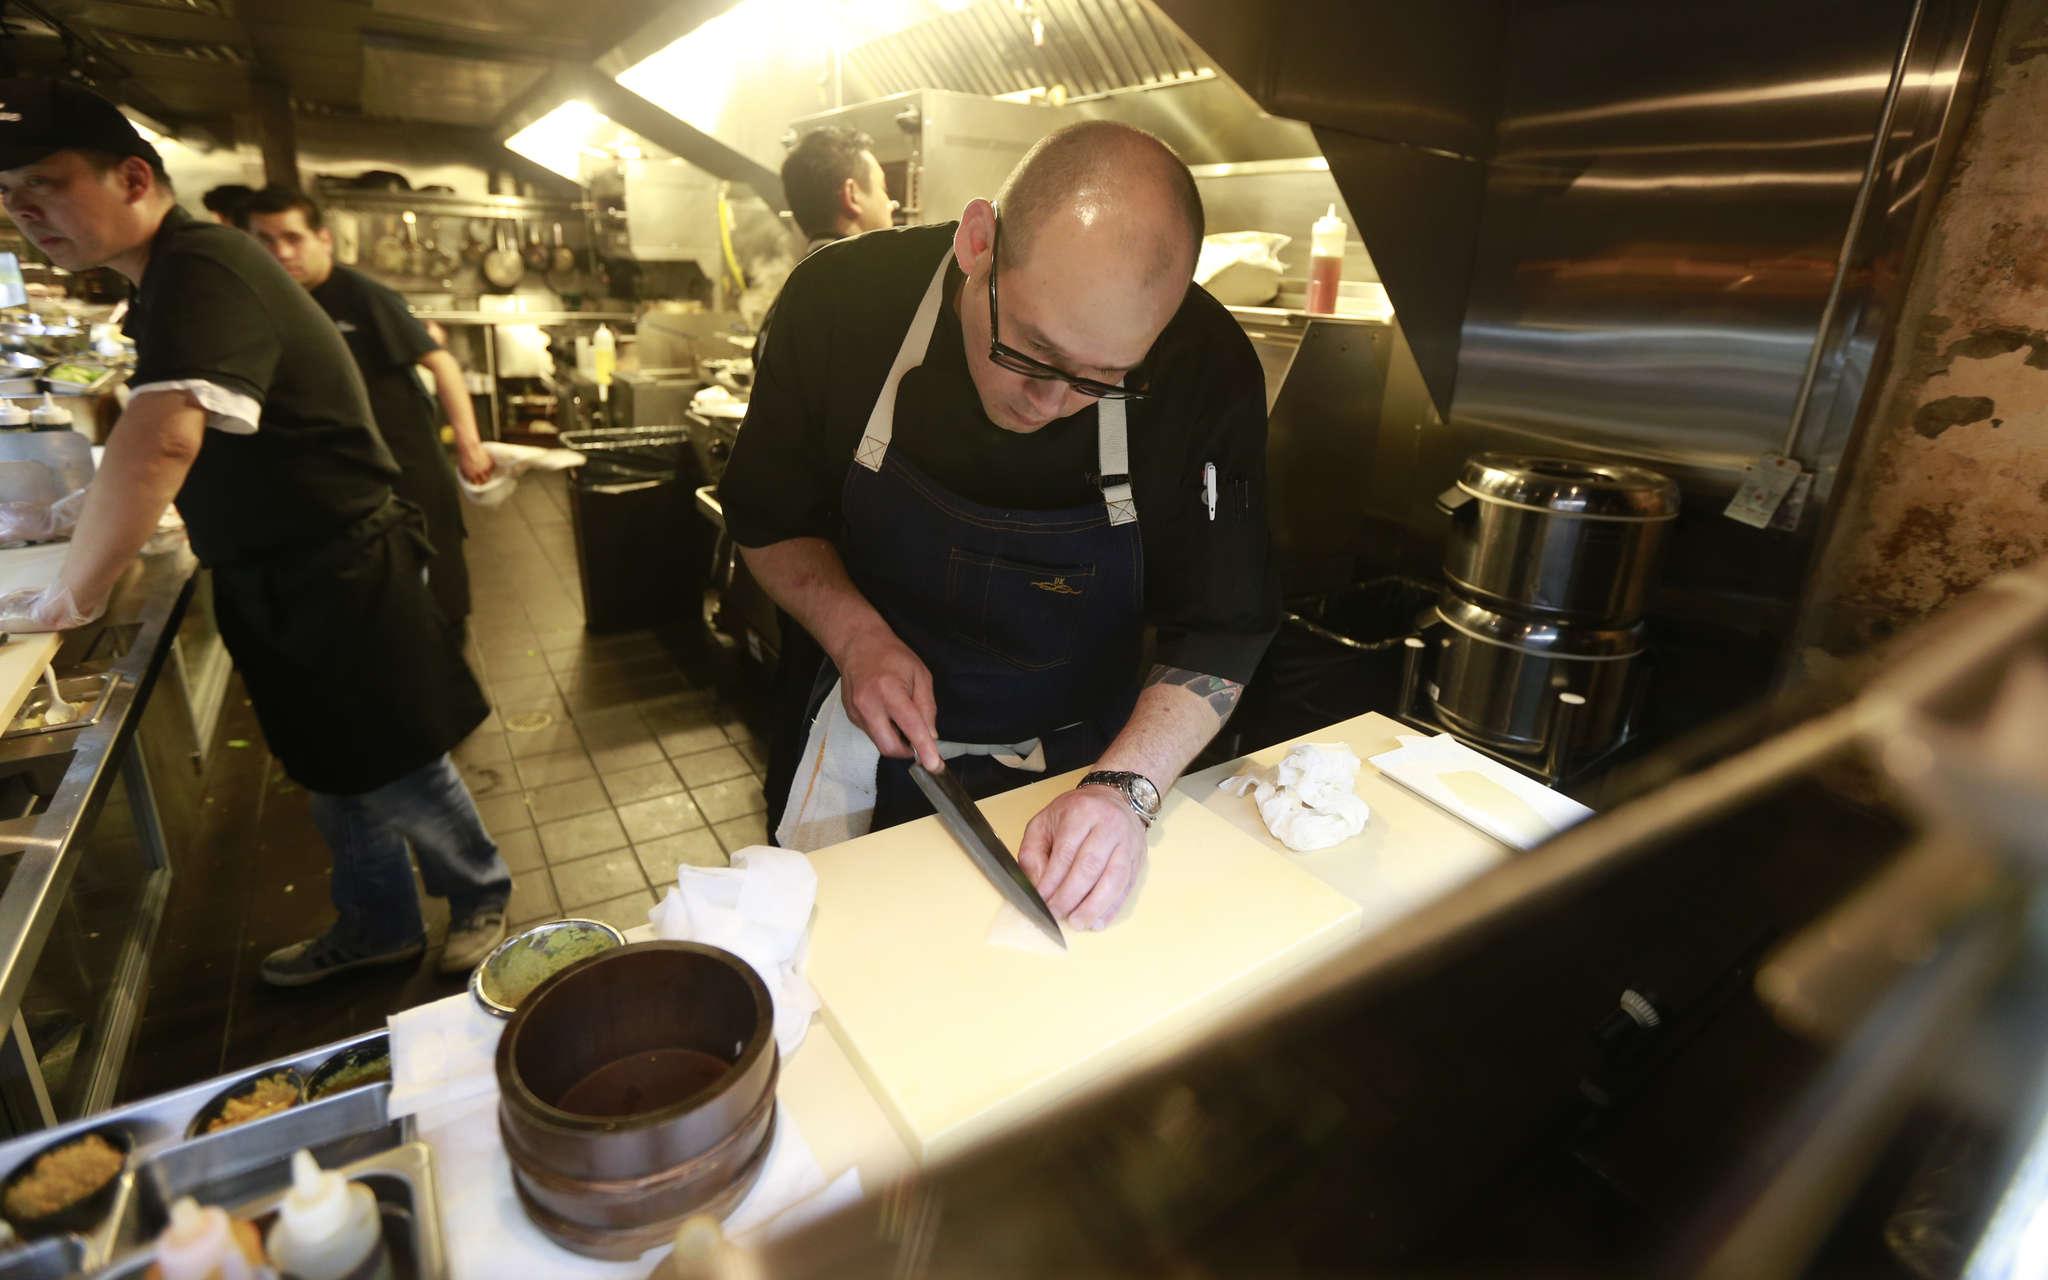 Chef Kevin Yanaga worked for three years at Michael Schulson´s Izakaya in Atlantic City.